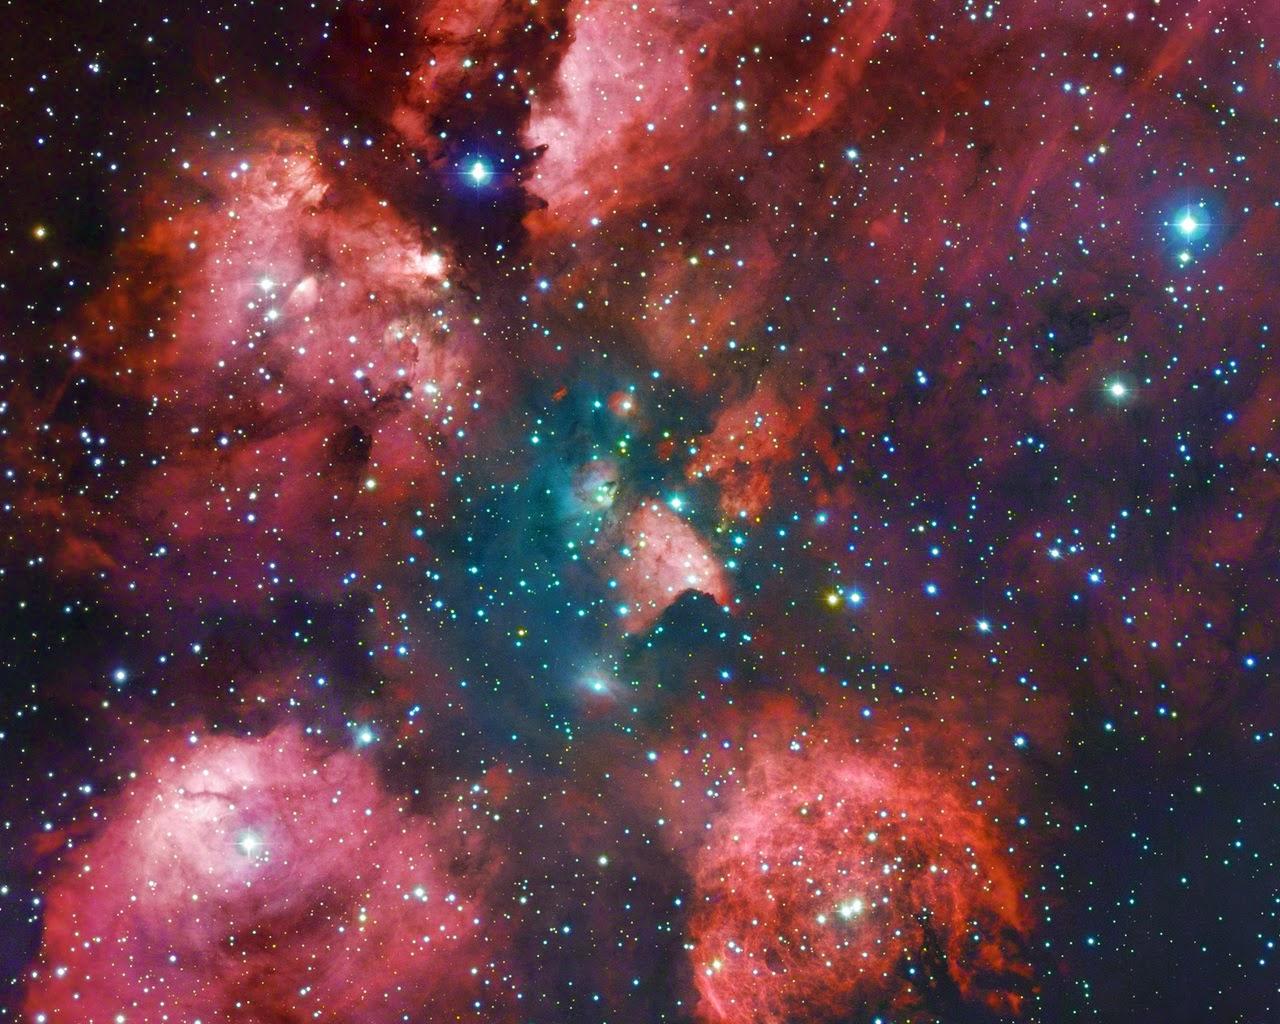 Nebulosa, Classificação das Nebulosas